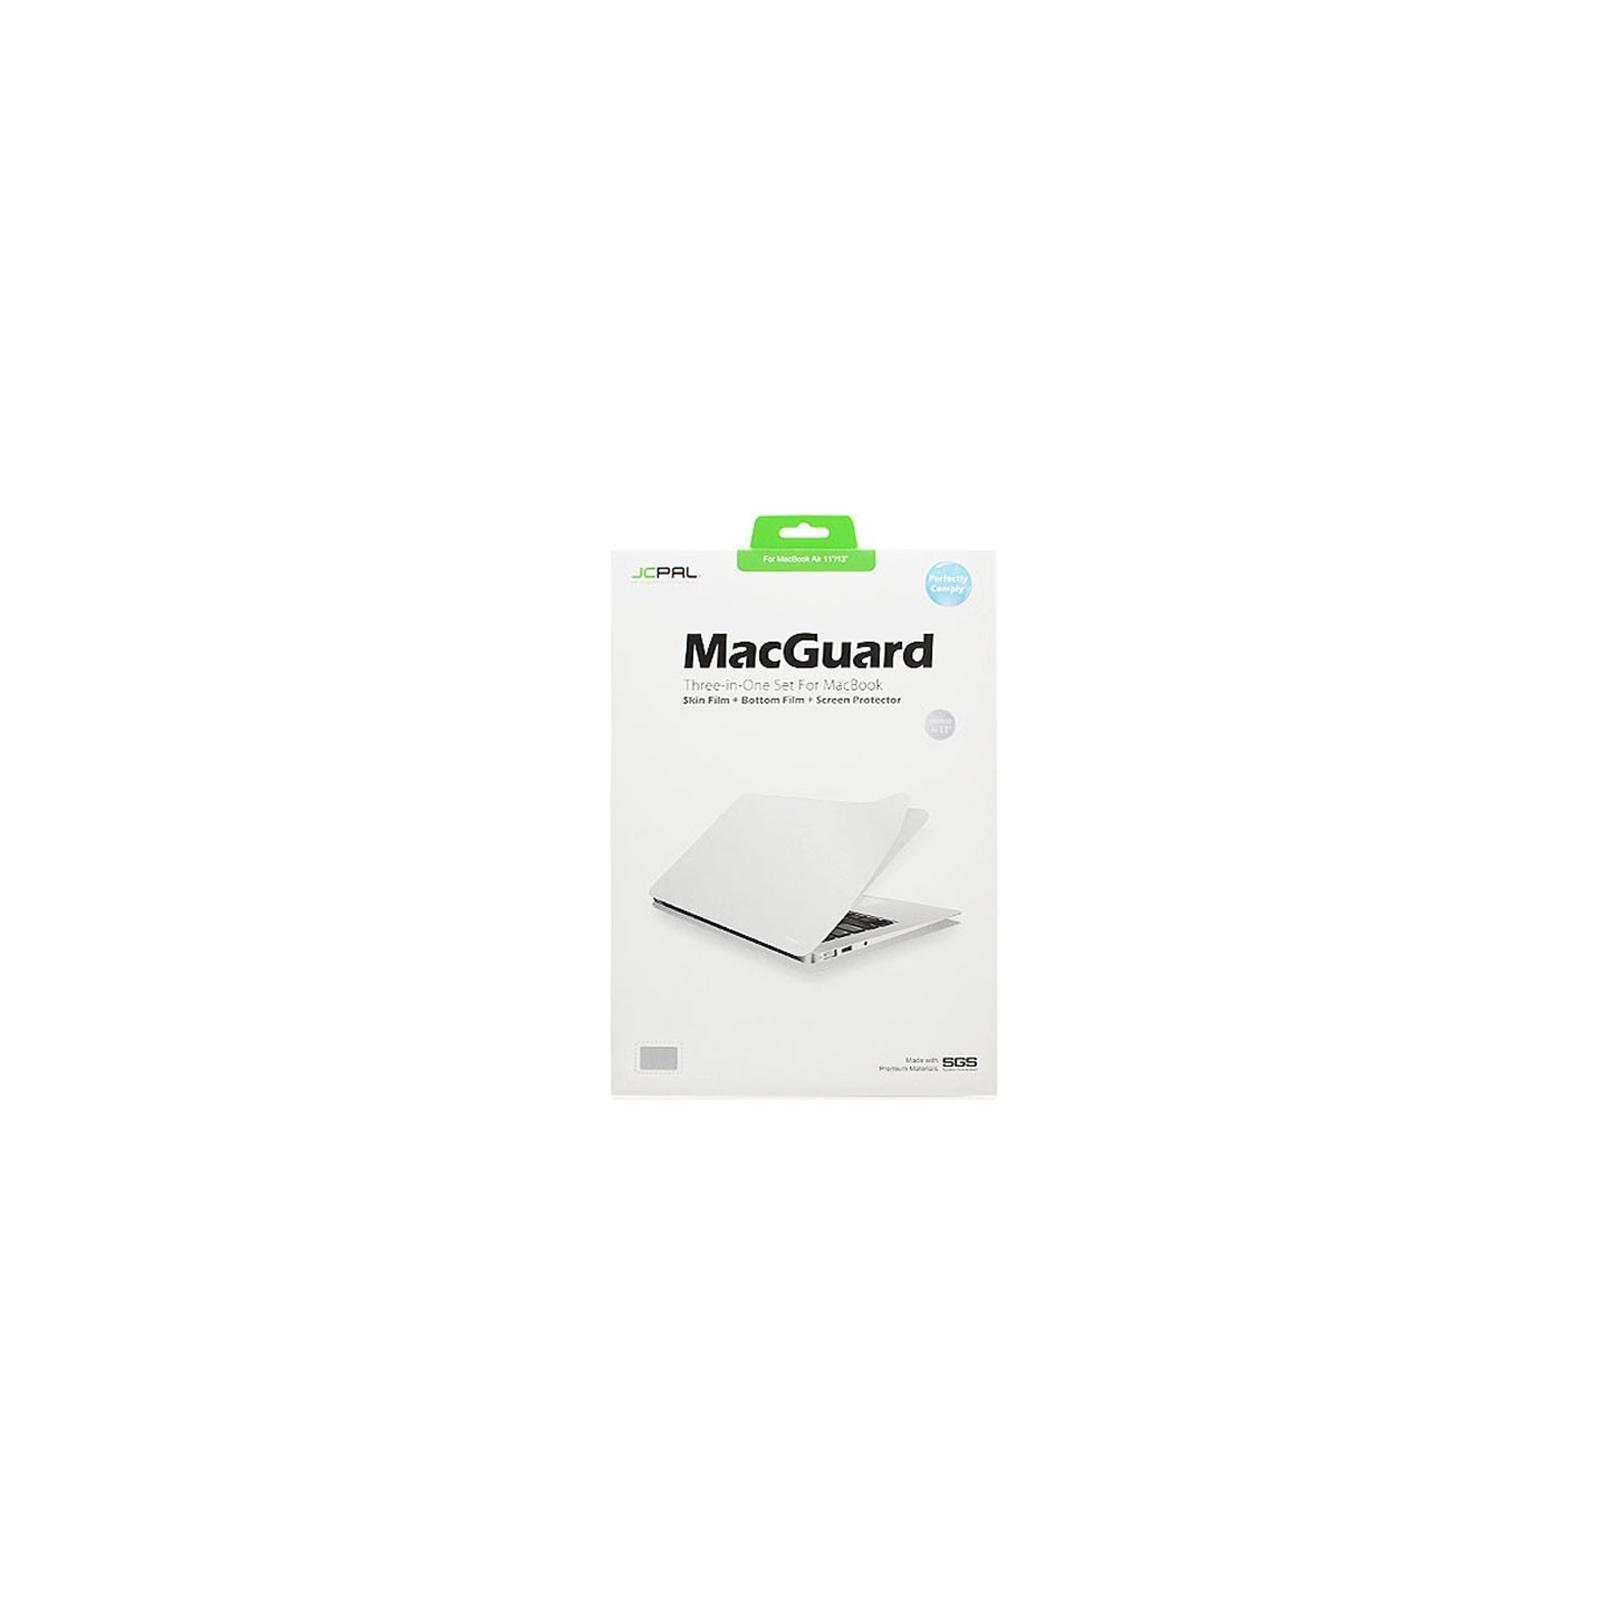 Пленка защитная JCPAL 3 in 1 set для MacBook Pro 13 (JCP2045)